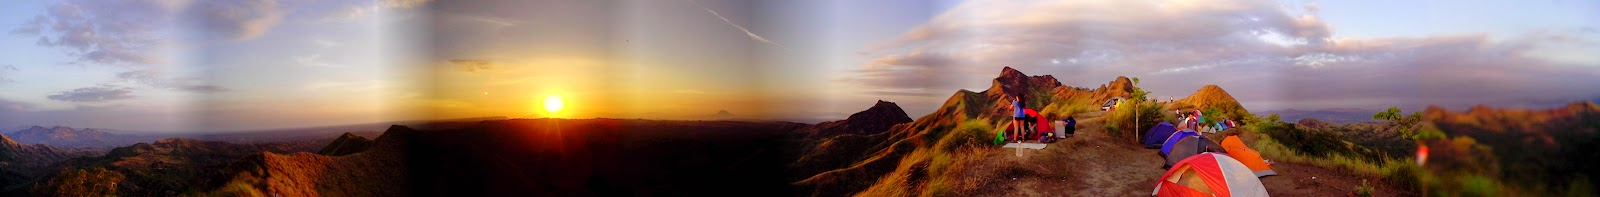 Sunrise in Mt. Batulao, Batangas